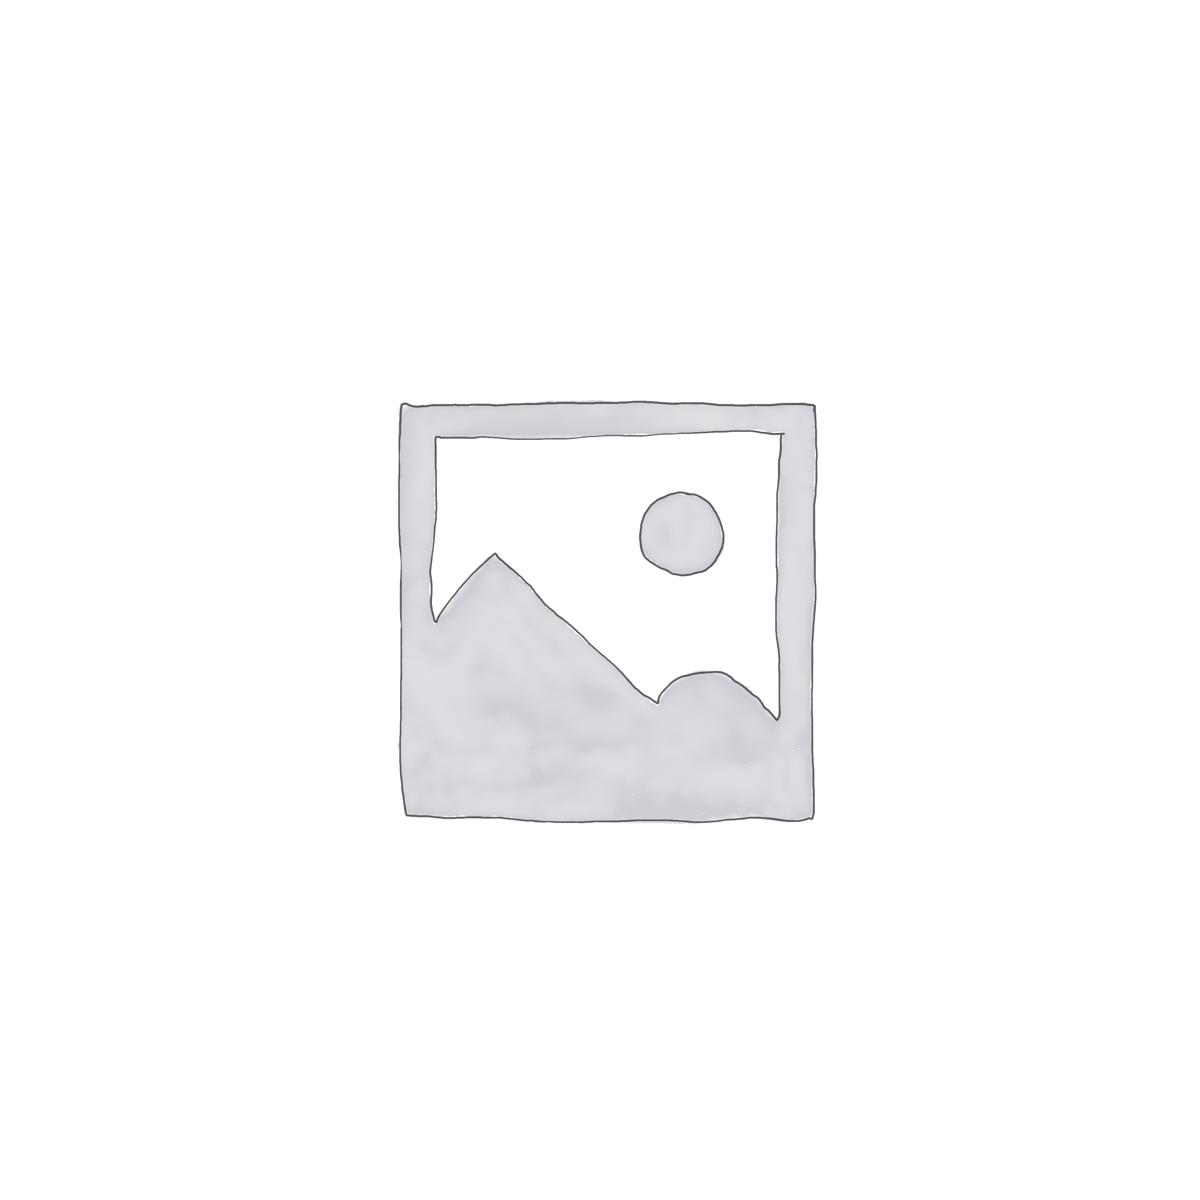 Green Banana Leaf Pattern Wallpaper Mural